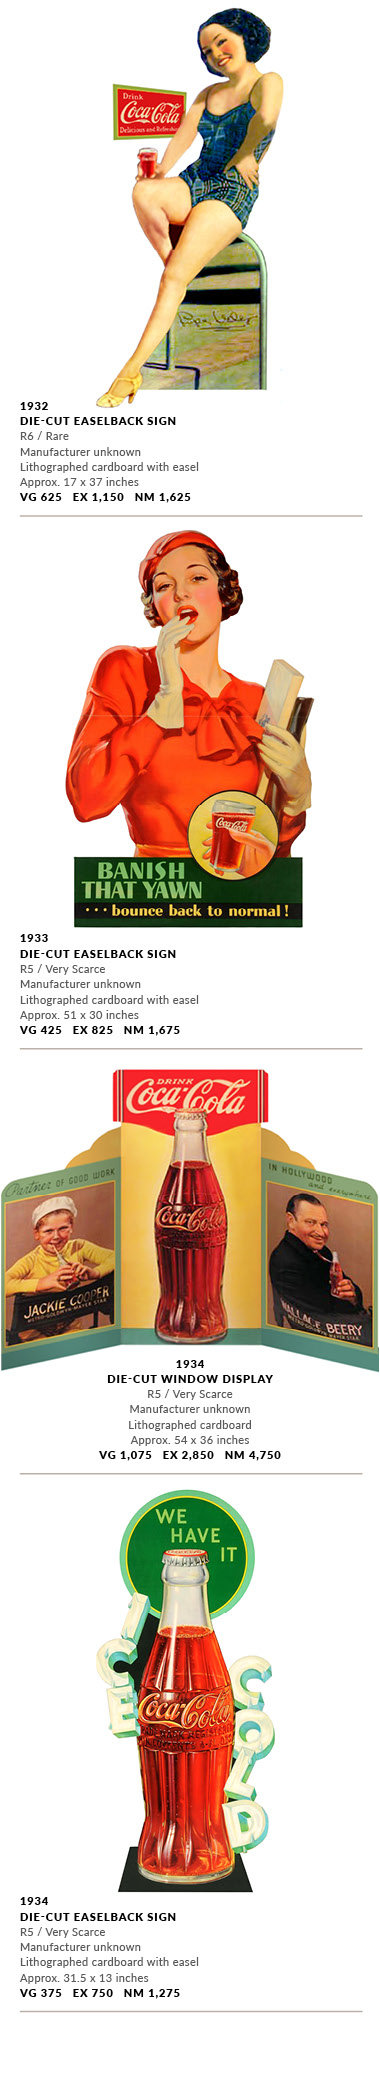 1930-1949DieCutsPHONE_6.jpg